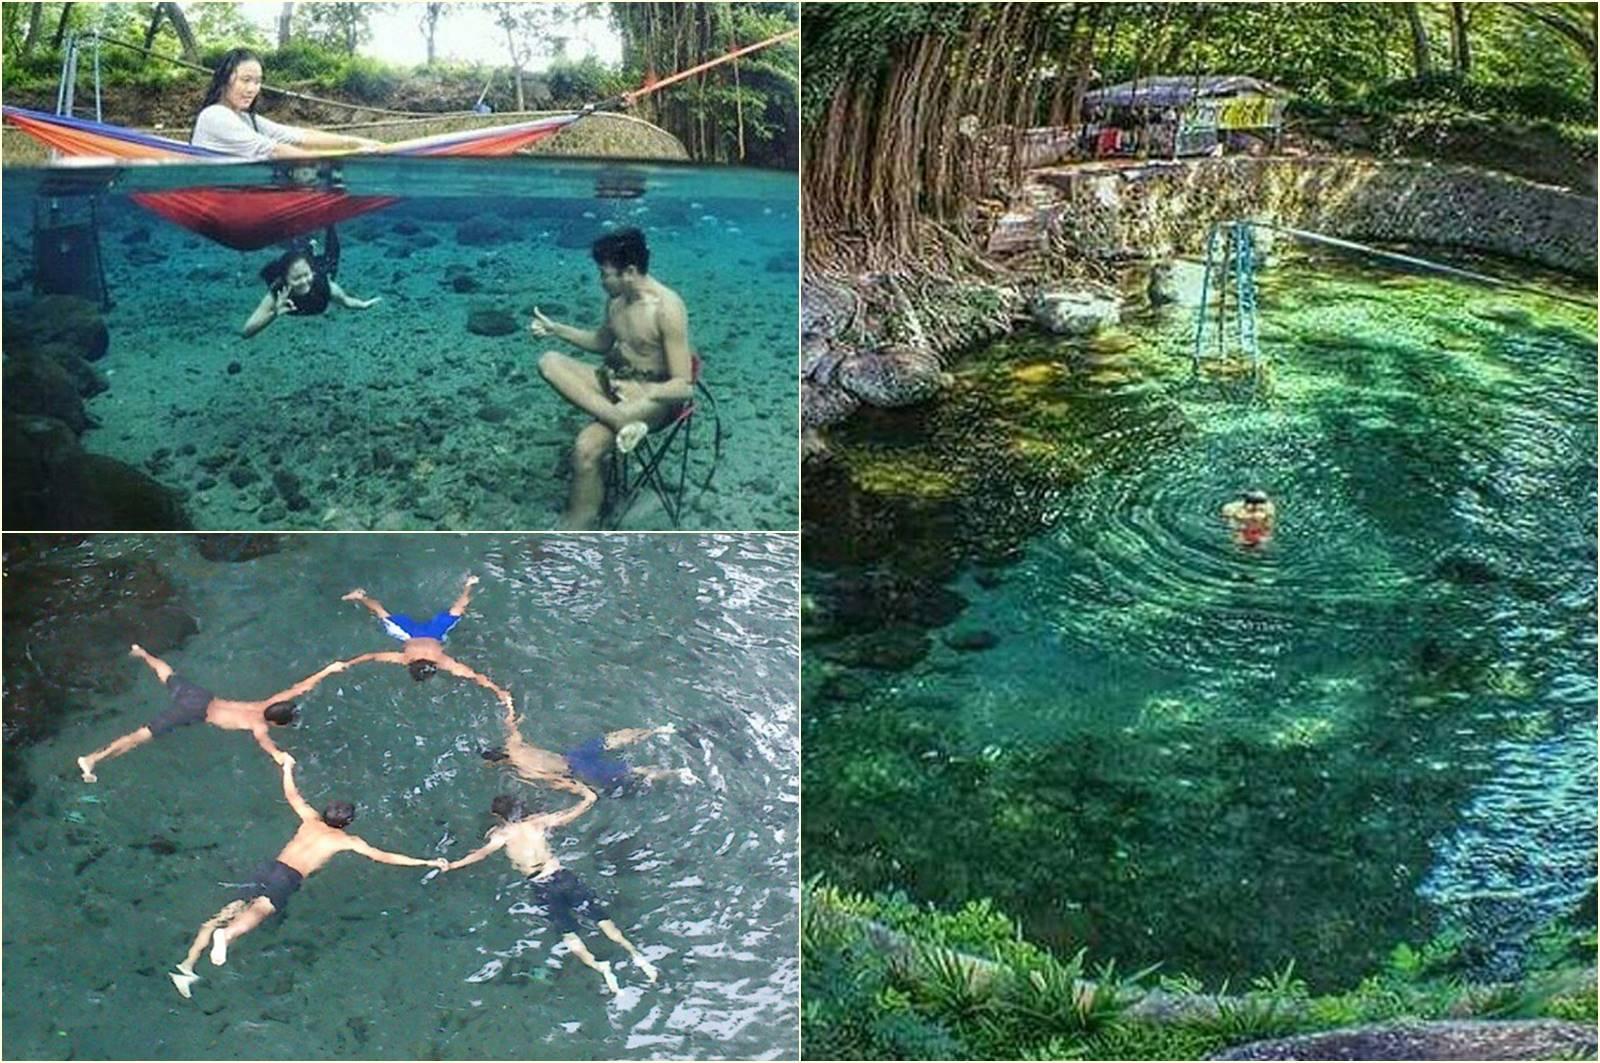 Klaten Desa Umbul Ponggok Aqua Pabrik Potensi Wisata Kabupaten Nilo